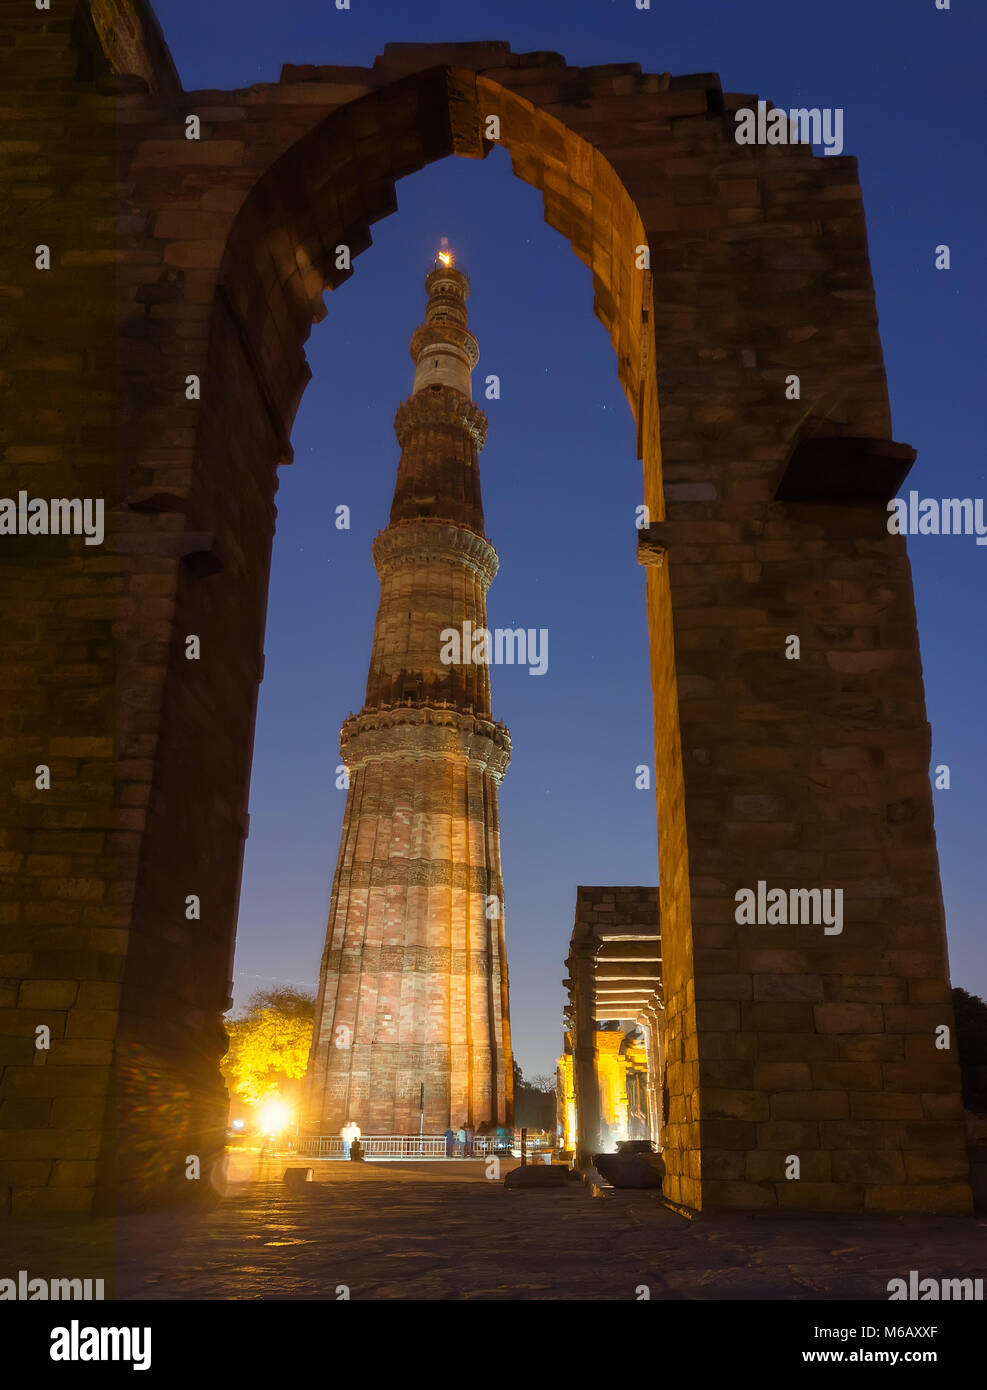 Qutub Minar - Stock Image